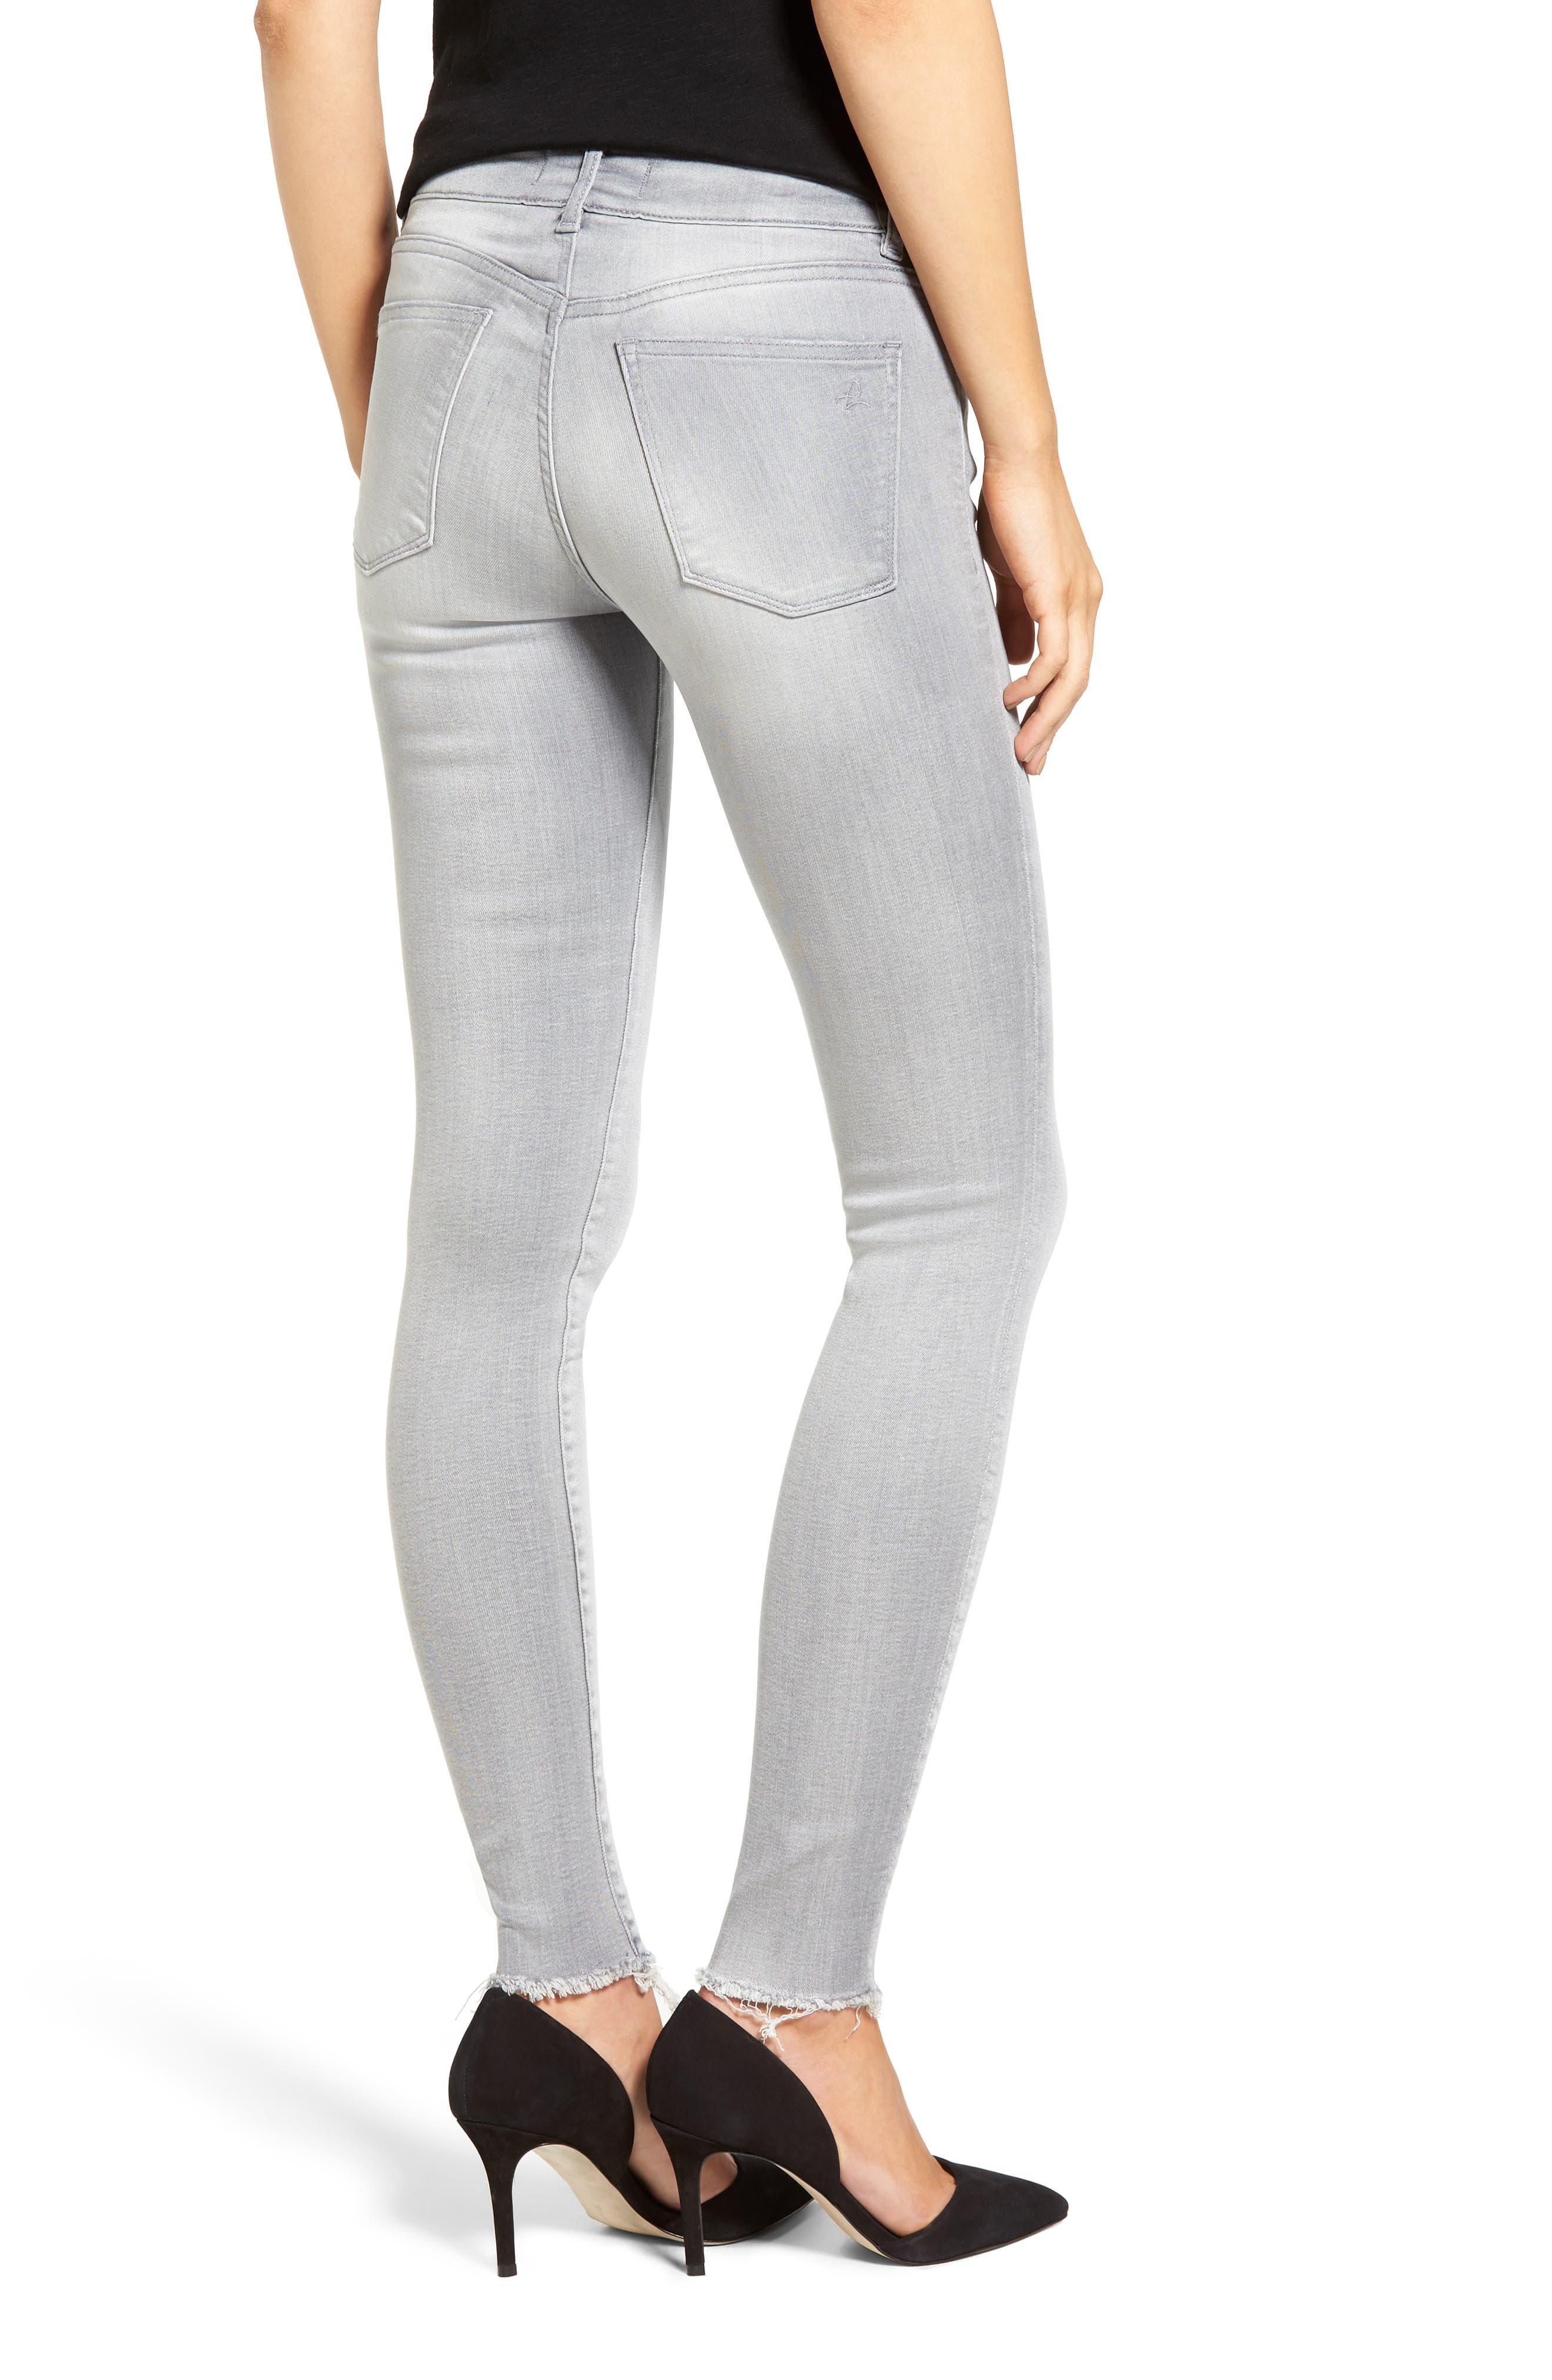 Emma Power Legging Jeans,                             Alternate thumbnail 2, color,                             020